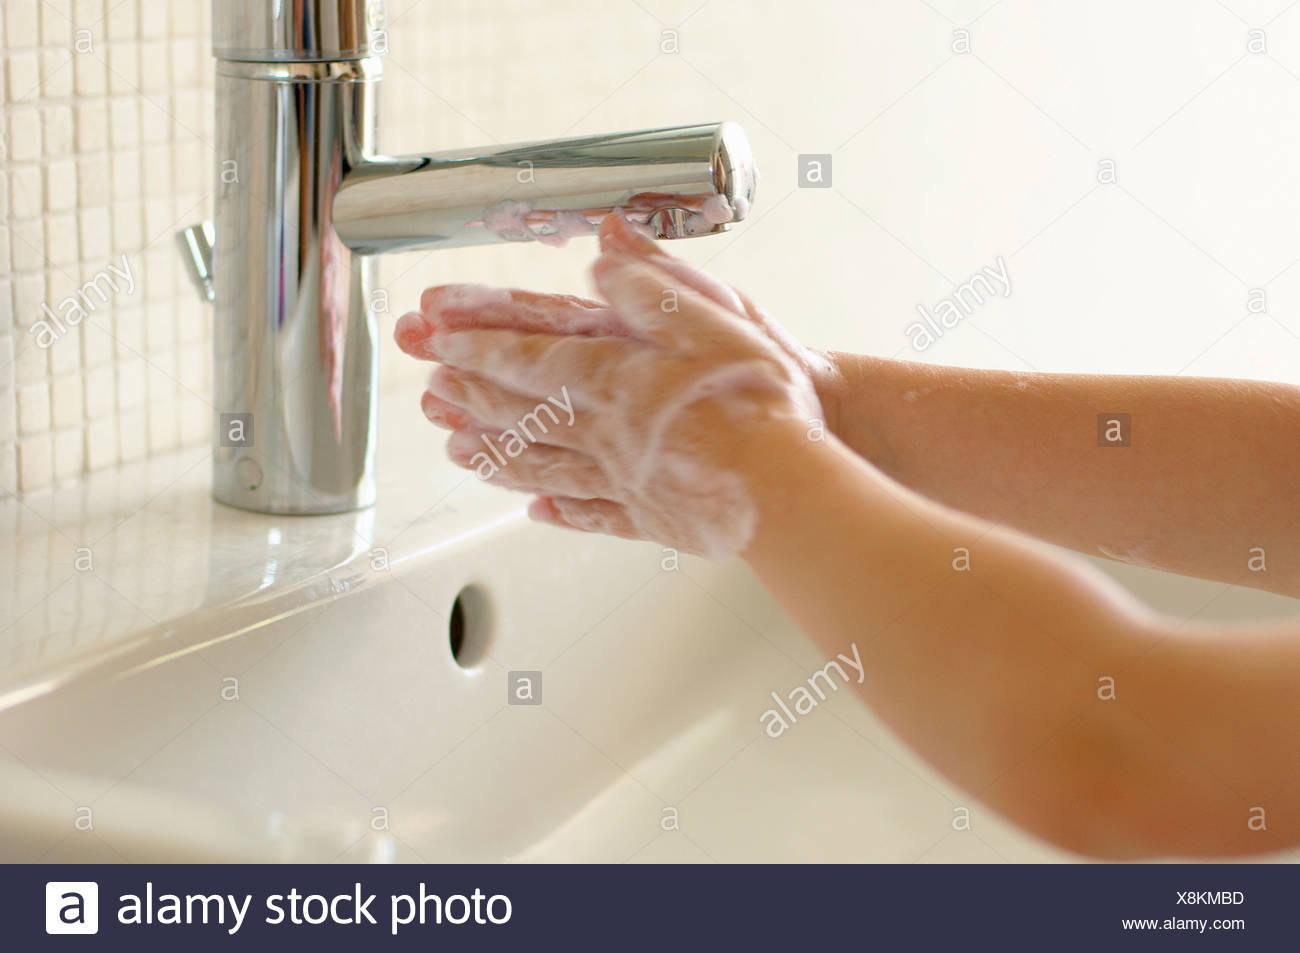 Boy washing hands at sink, Den Haag, Netherlands - Stock Image